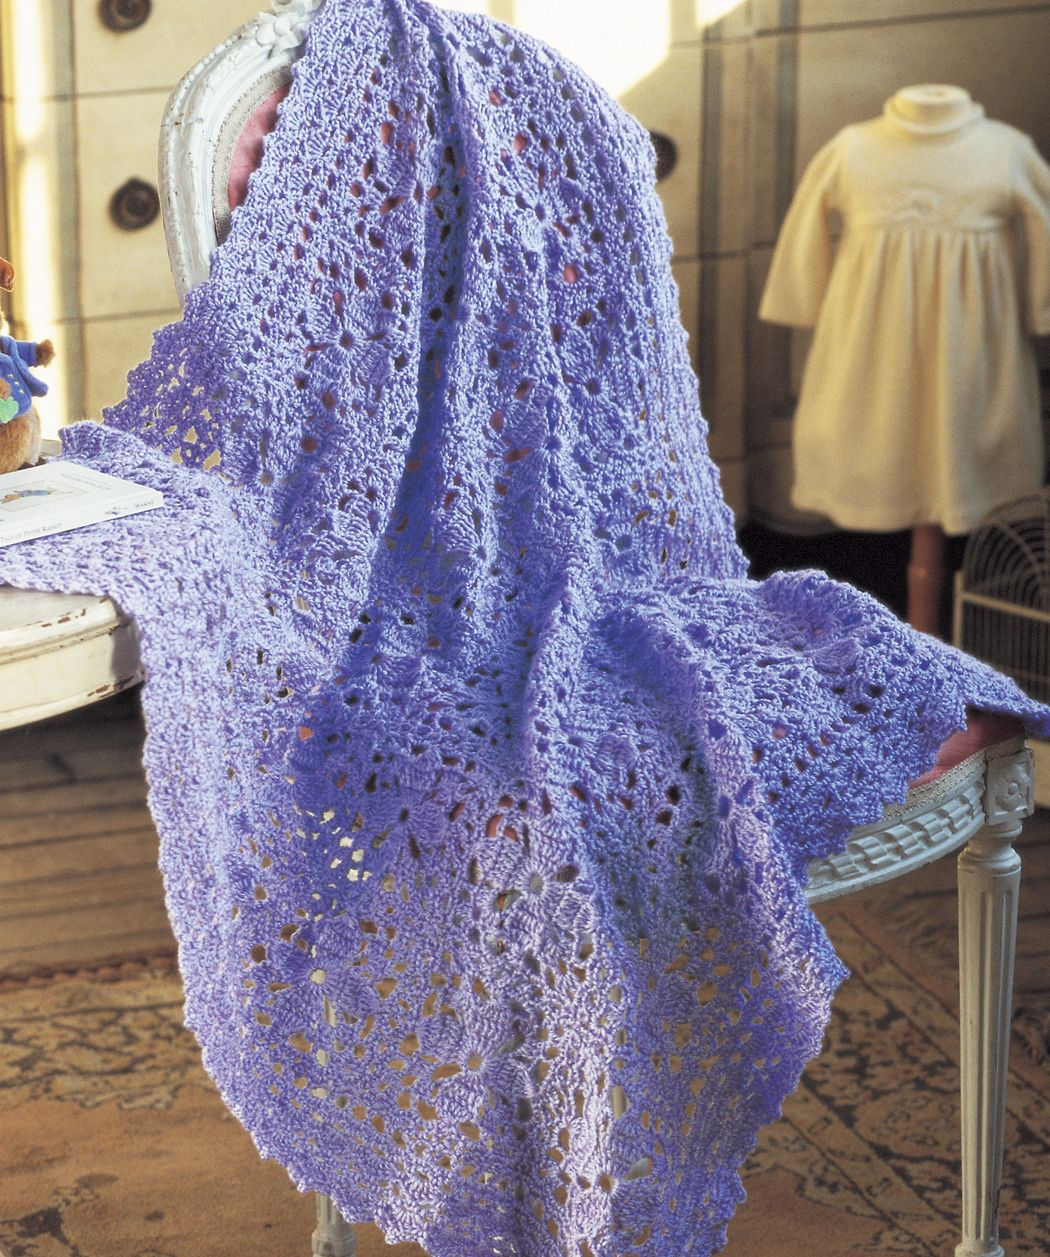 Lacy Lilac Blanket | Cavijas de bebe | Pinterest | Manta, Ganchillo ...